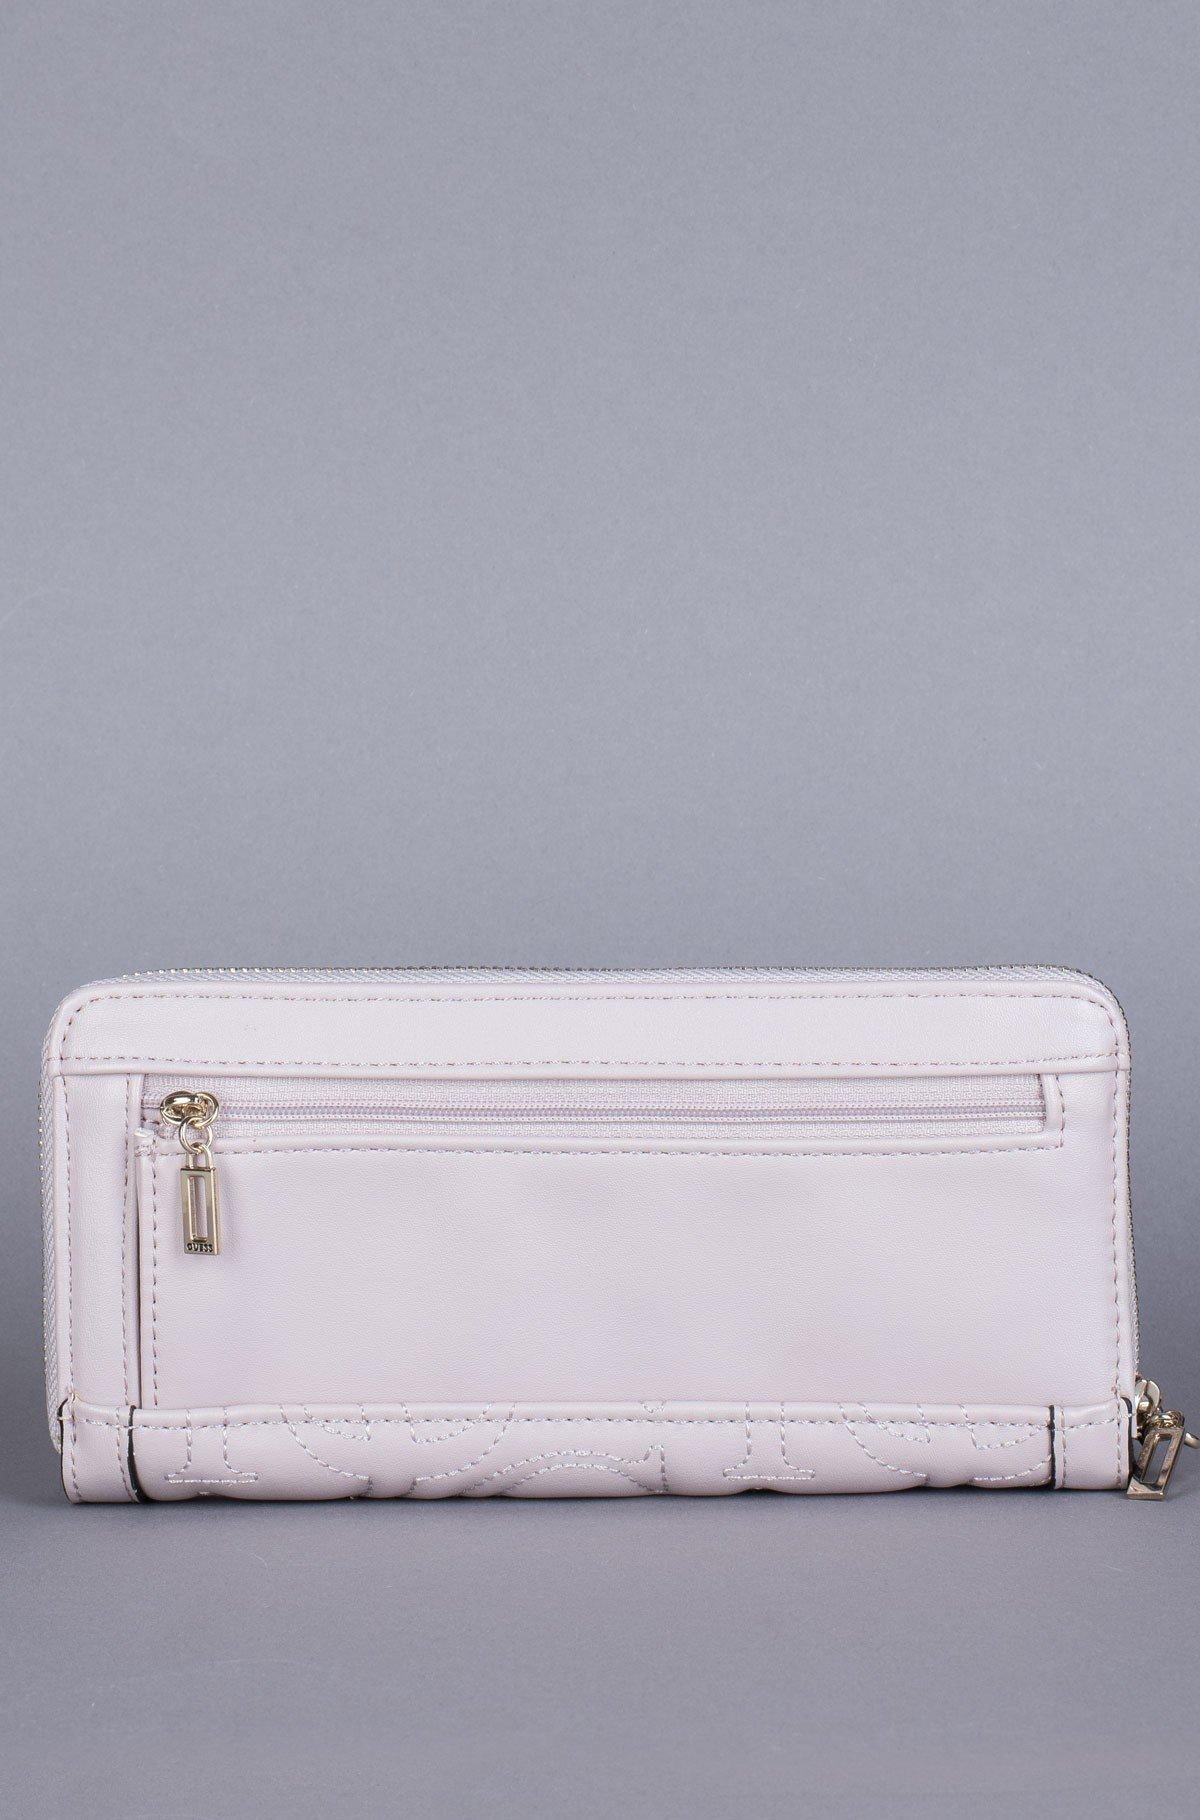 Wallet SWVG74 75460-full-3